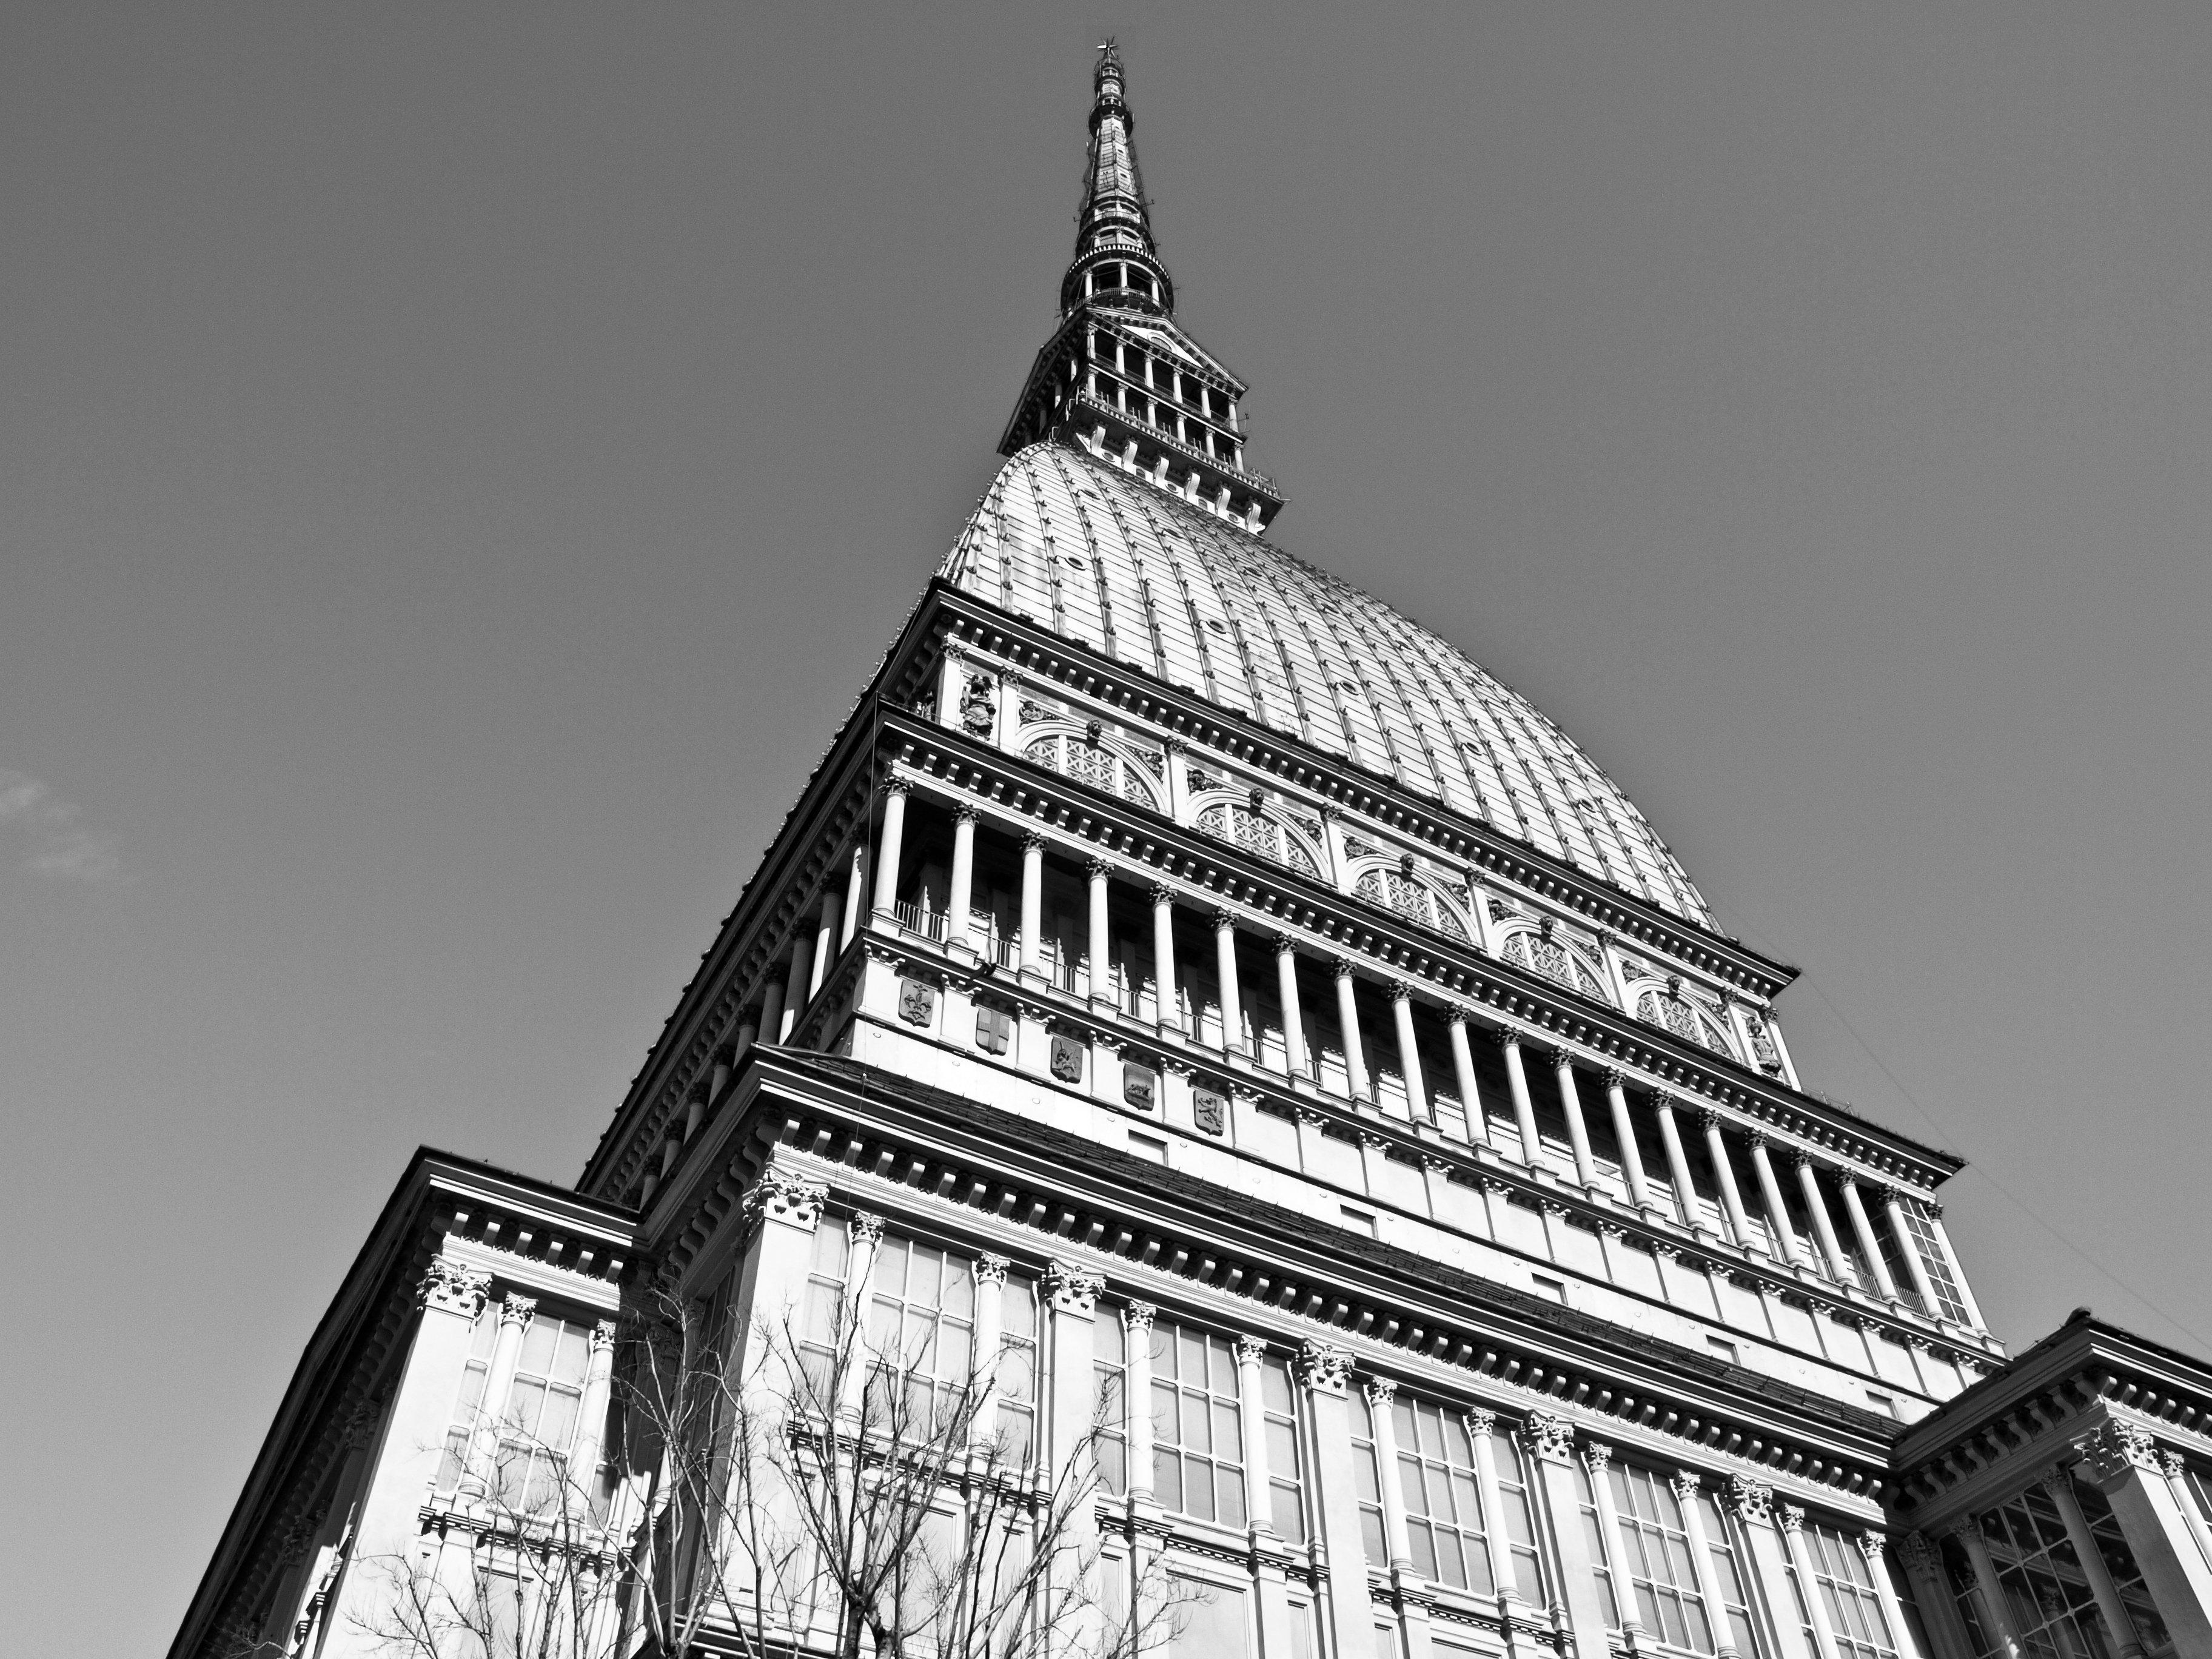 The Mole Antonelliana, Turin (Torino), Piedmont, Italy - over blue sky background